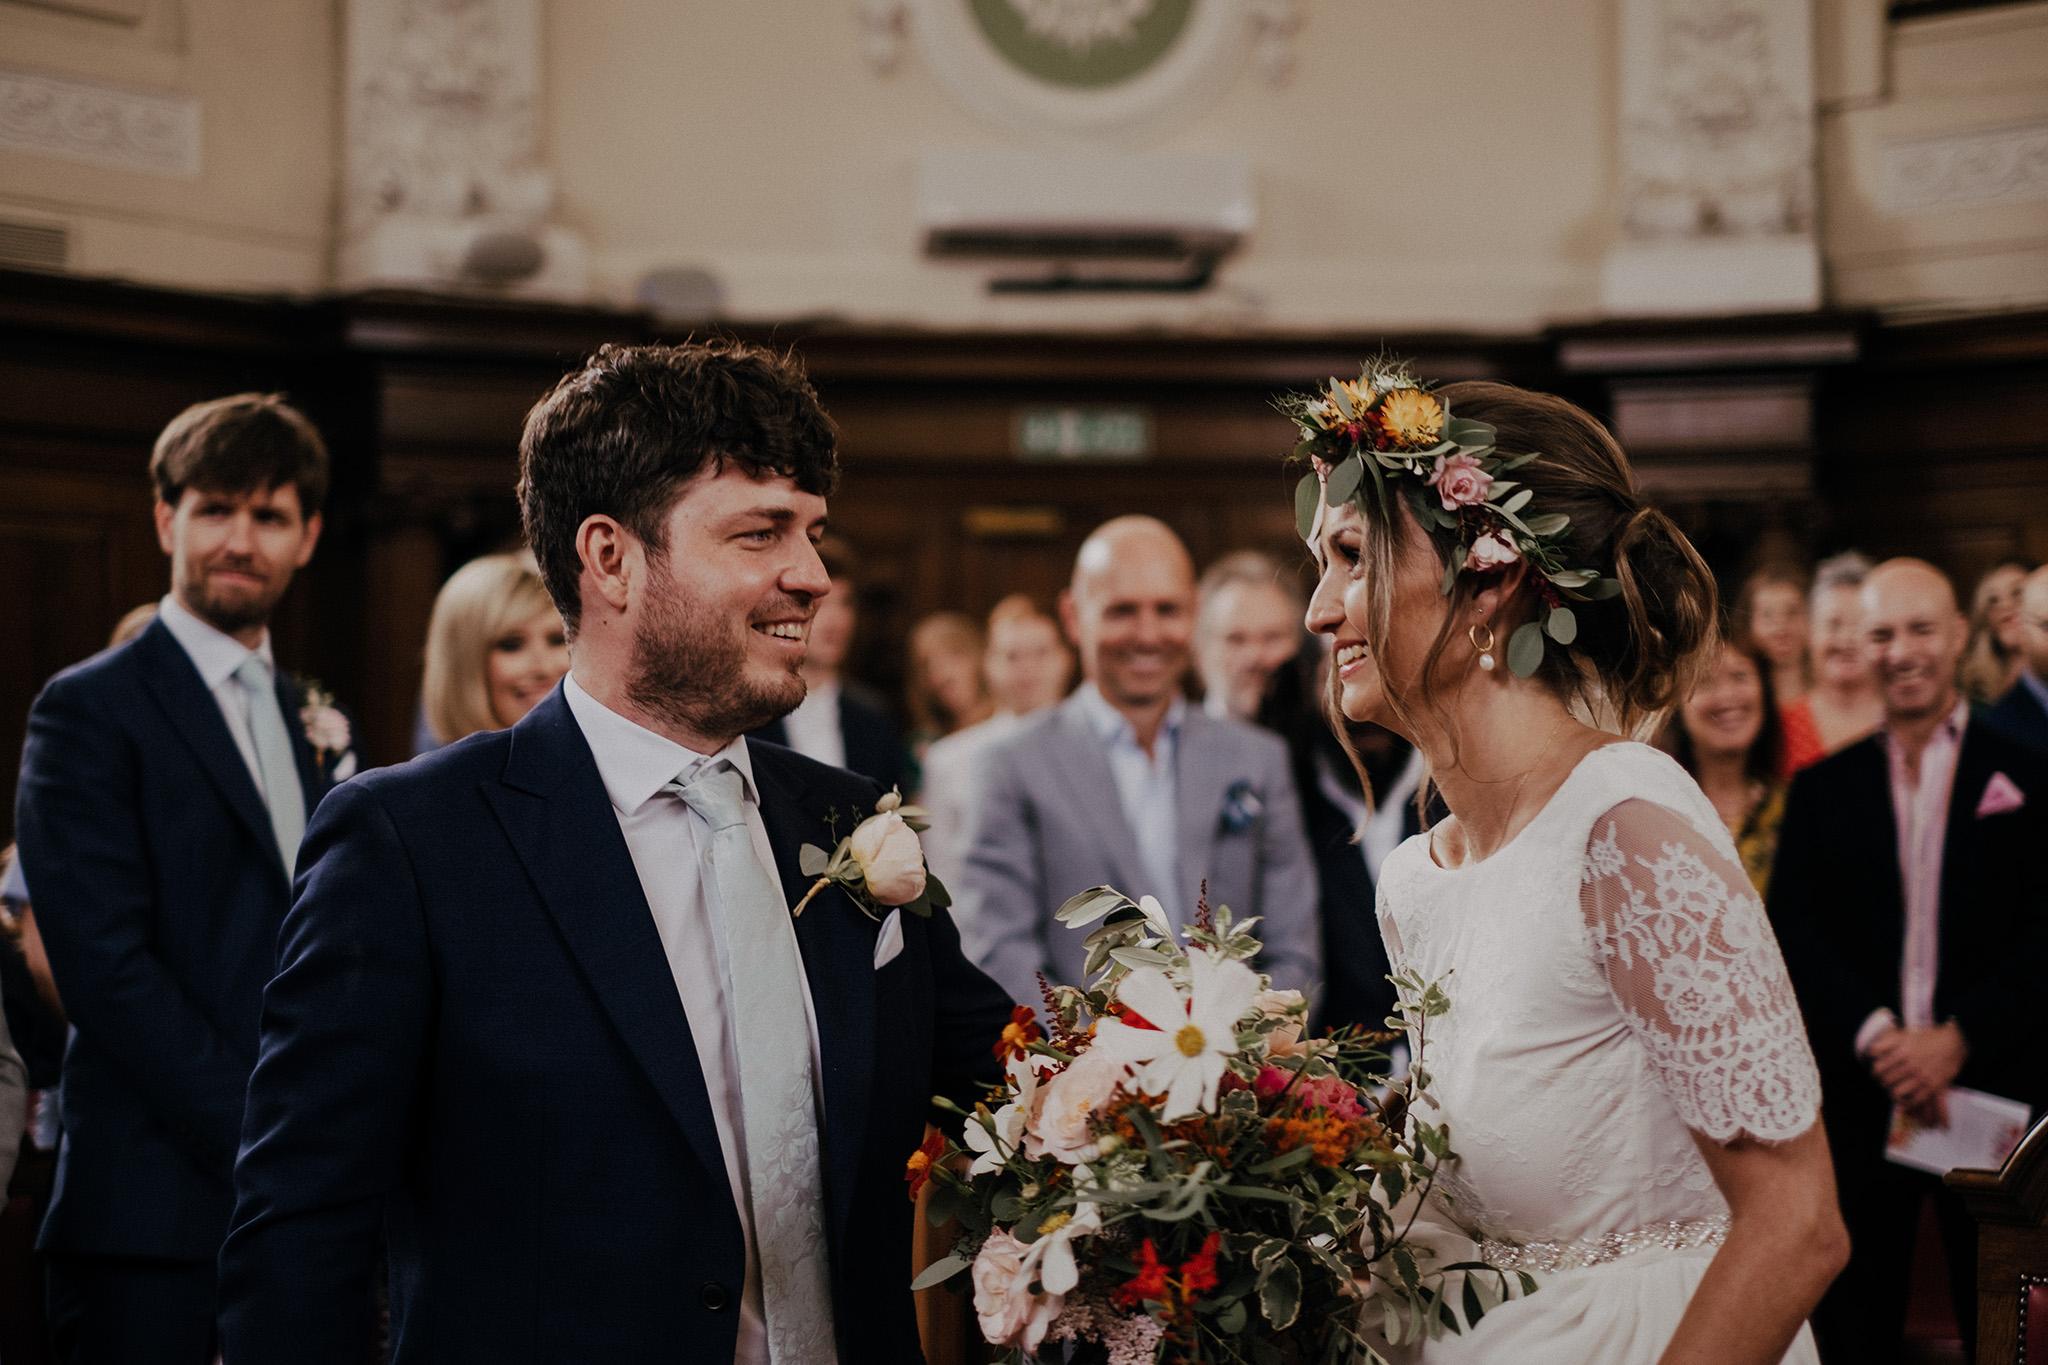 Islington-town-hall-wedding24.jpg